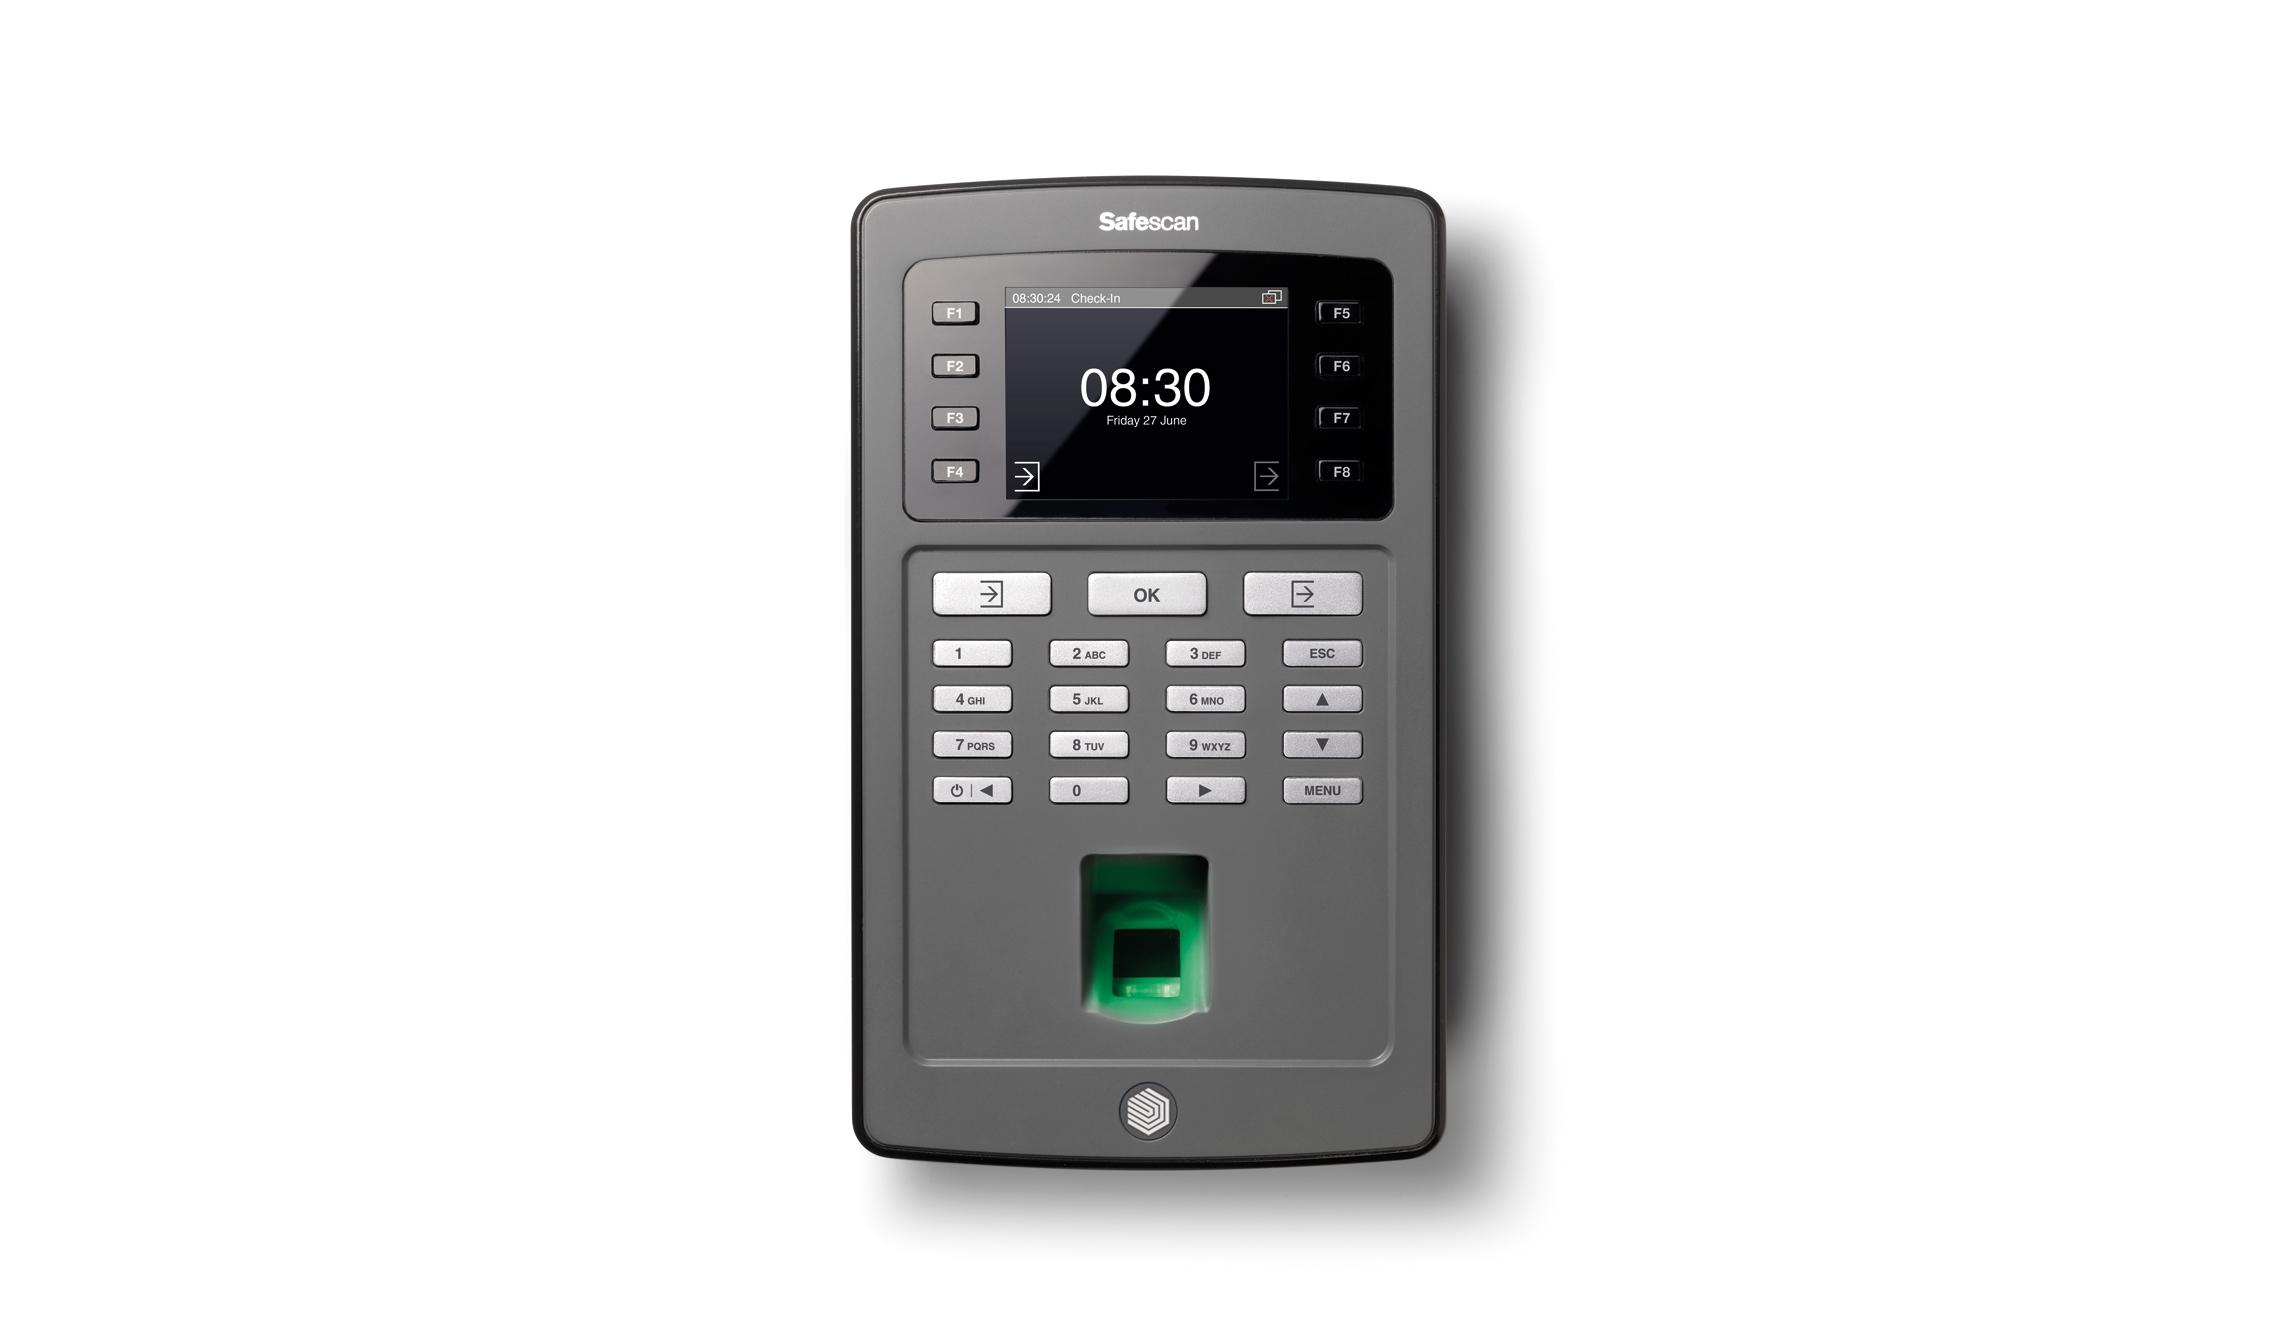 safescan-8020-tiempo-presencia